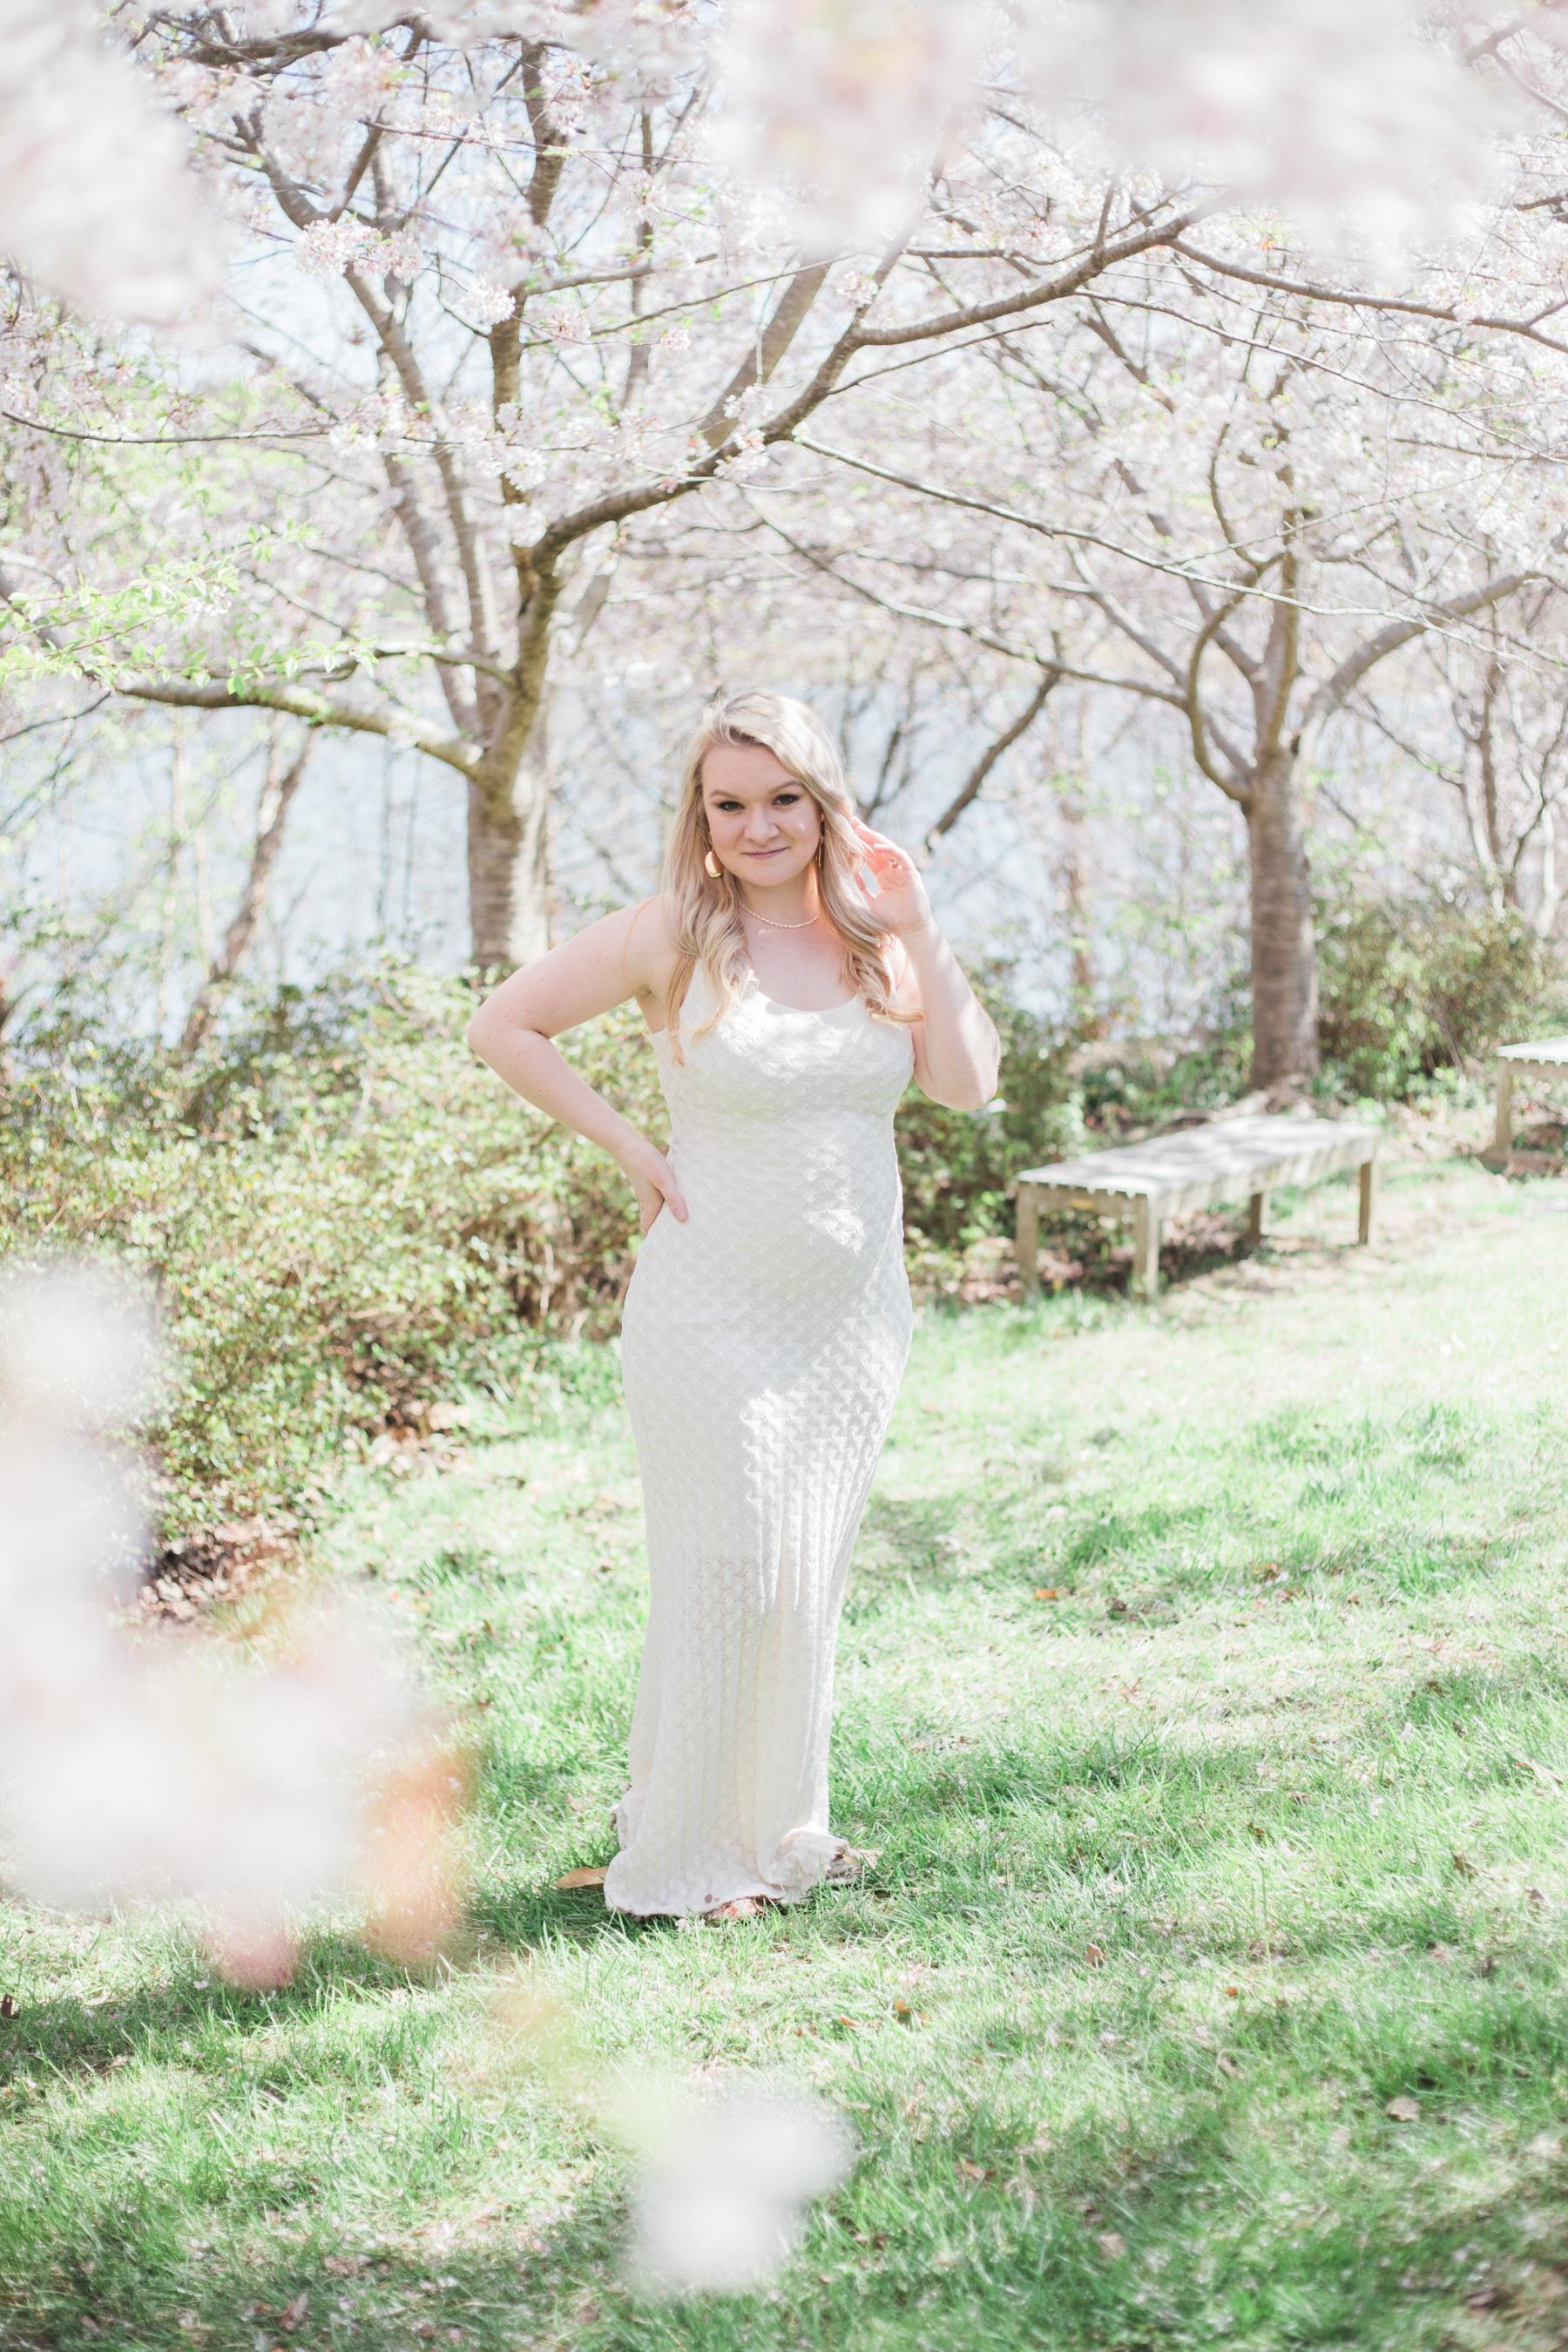 Spring Portraits   Richmond VA Photographer - MJ Mendoza